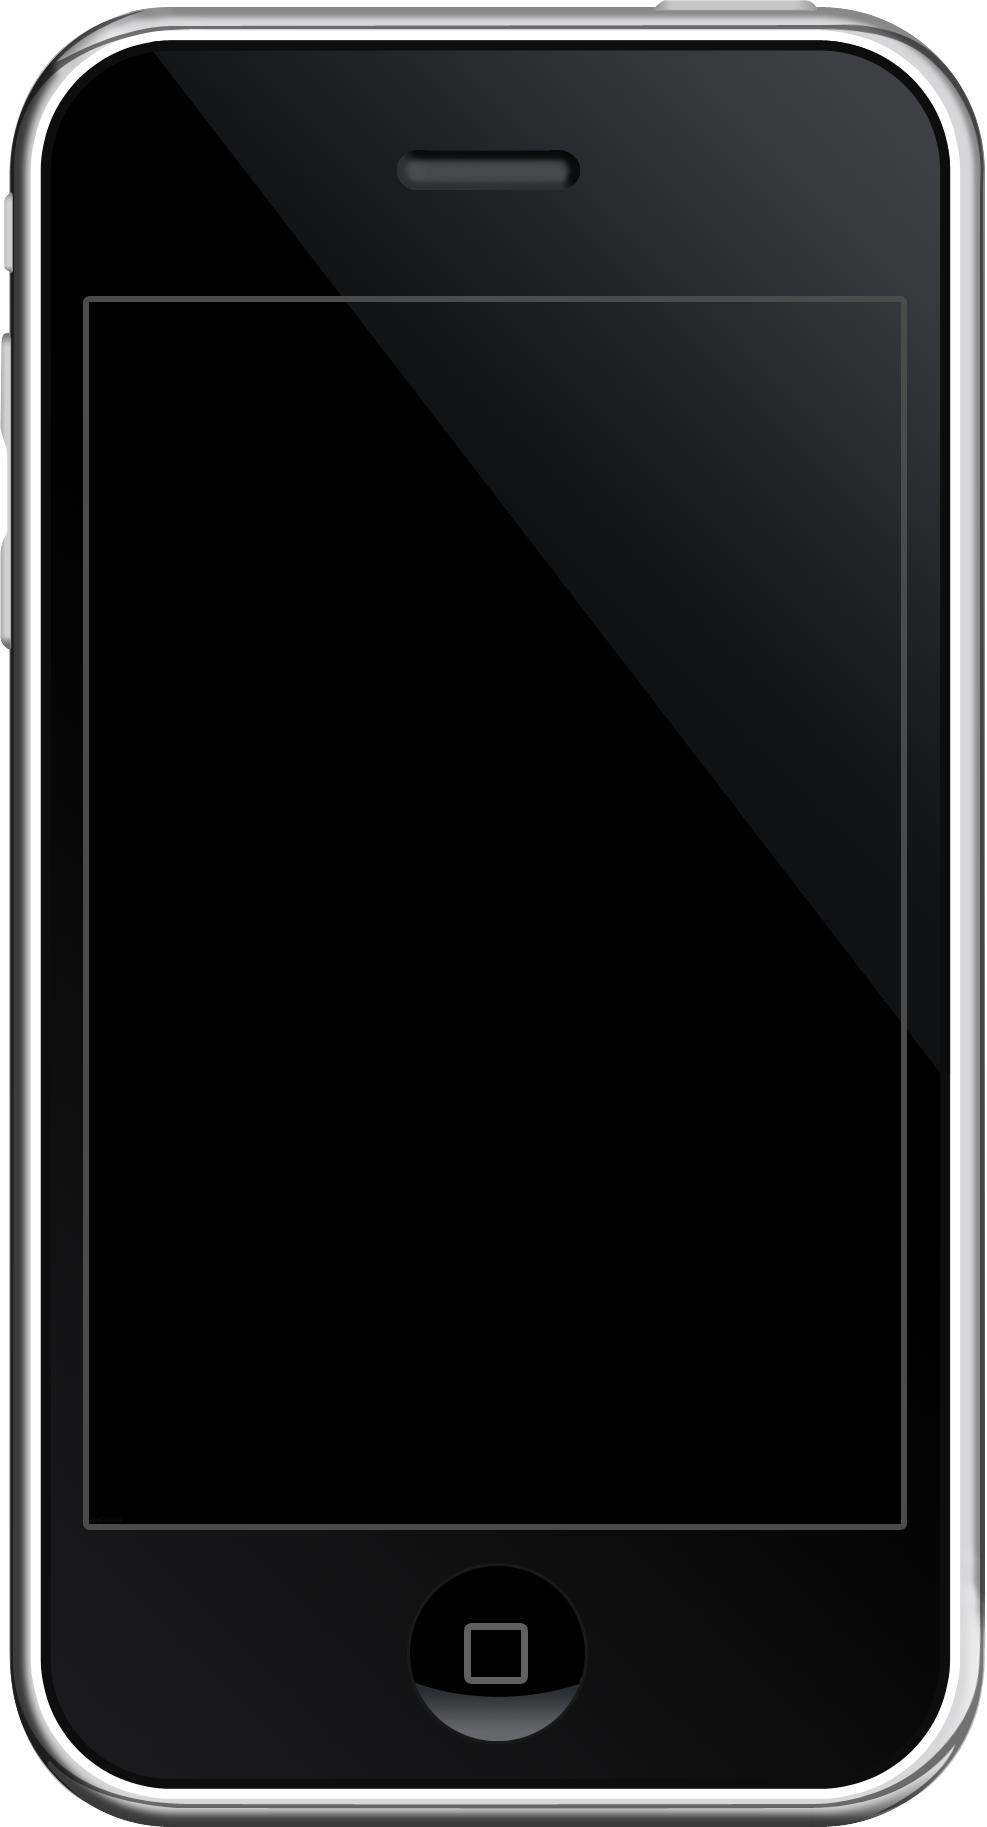 IPhone_PSD_White_3G